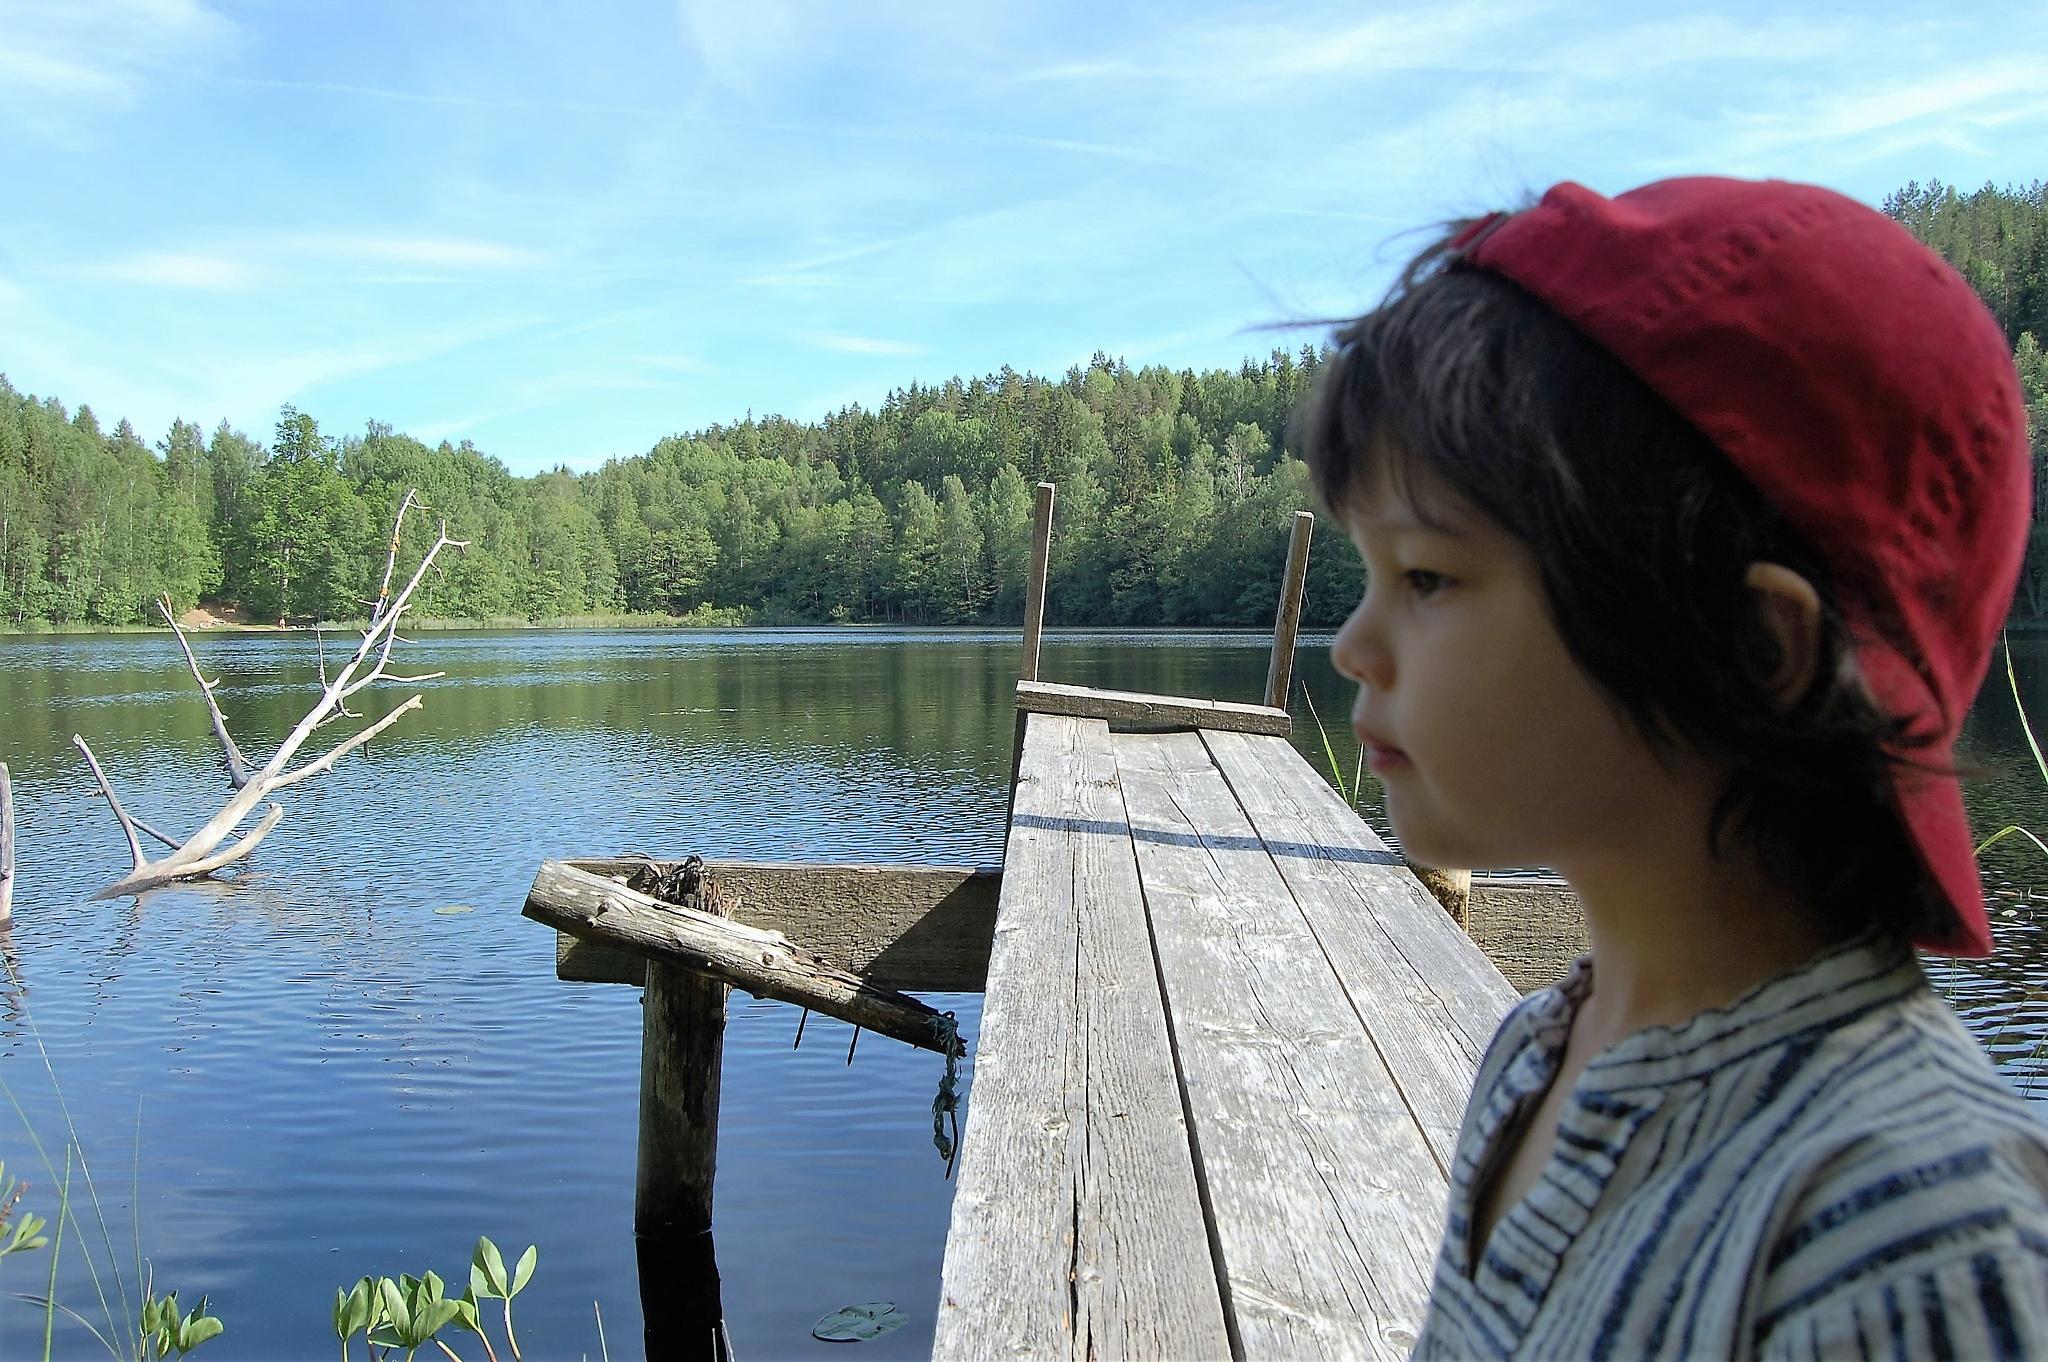 Silent mediation at the dock by lillemor.ekstrom ek